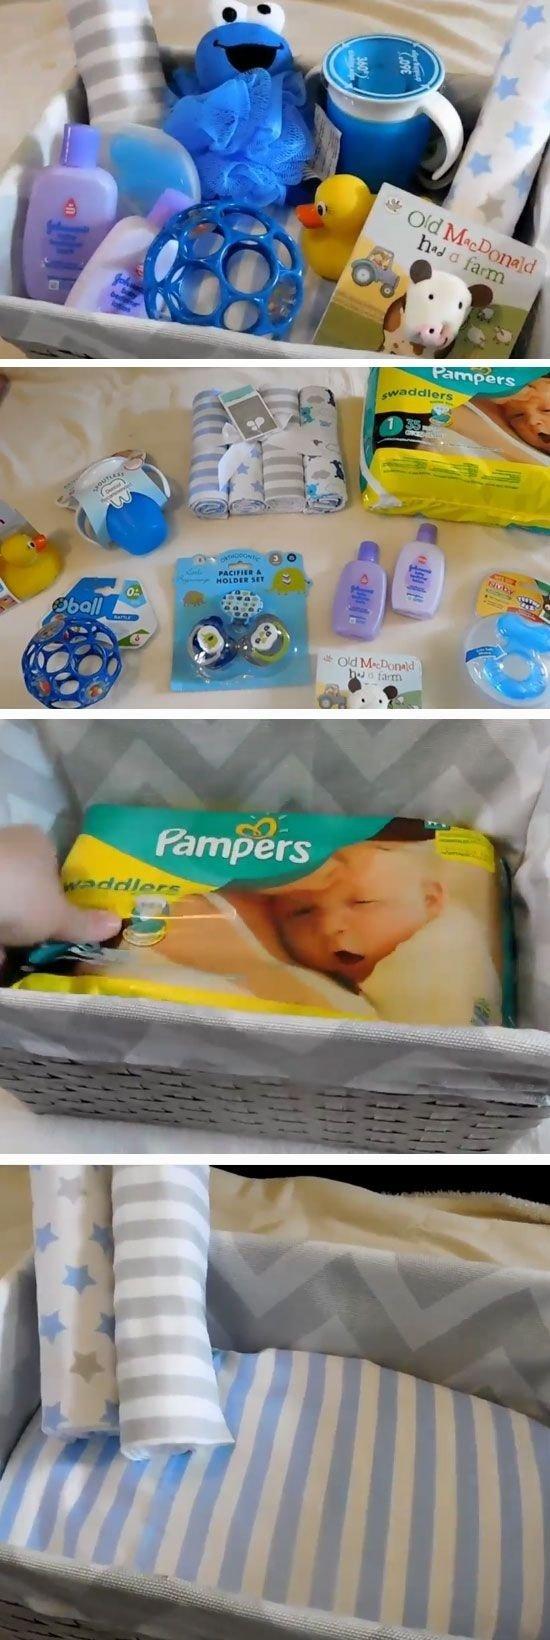 10 Beautiful Boy Baby Shower Gift Ideas diy baby shower gift basket ideas for boys baby shower gift basket 2 2020